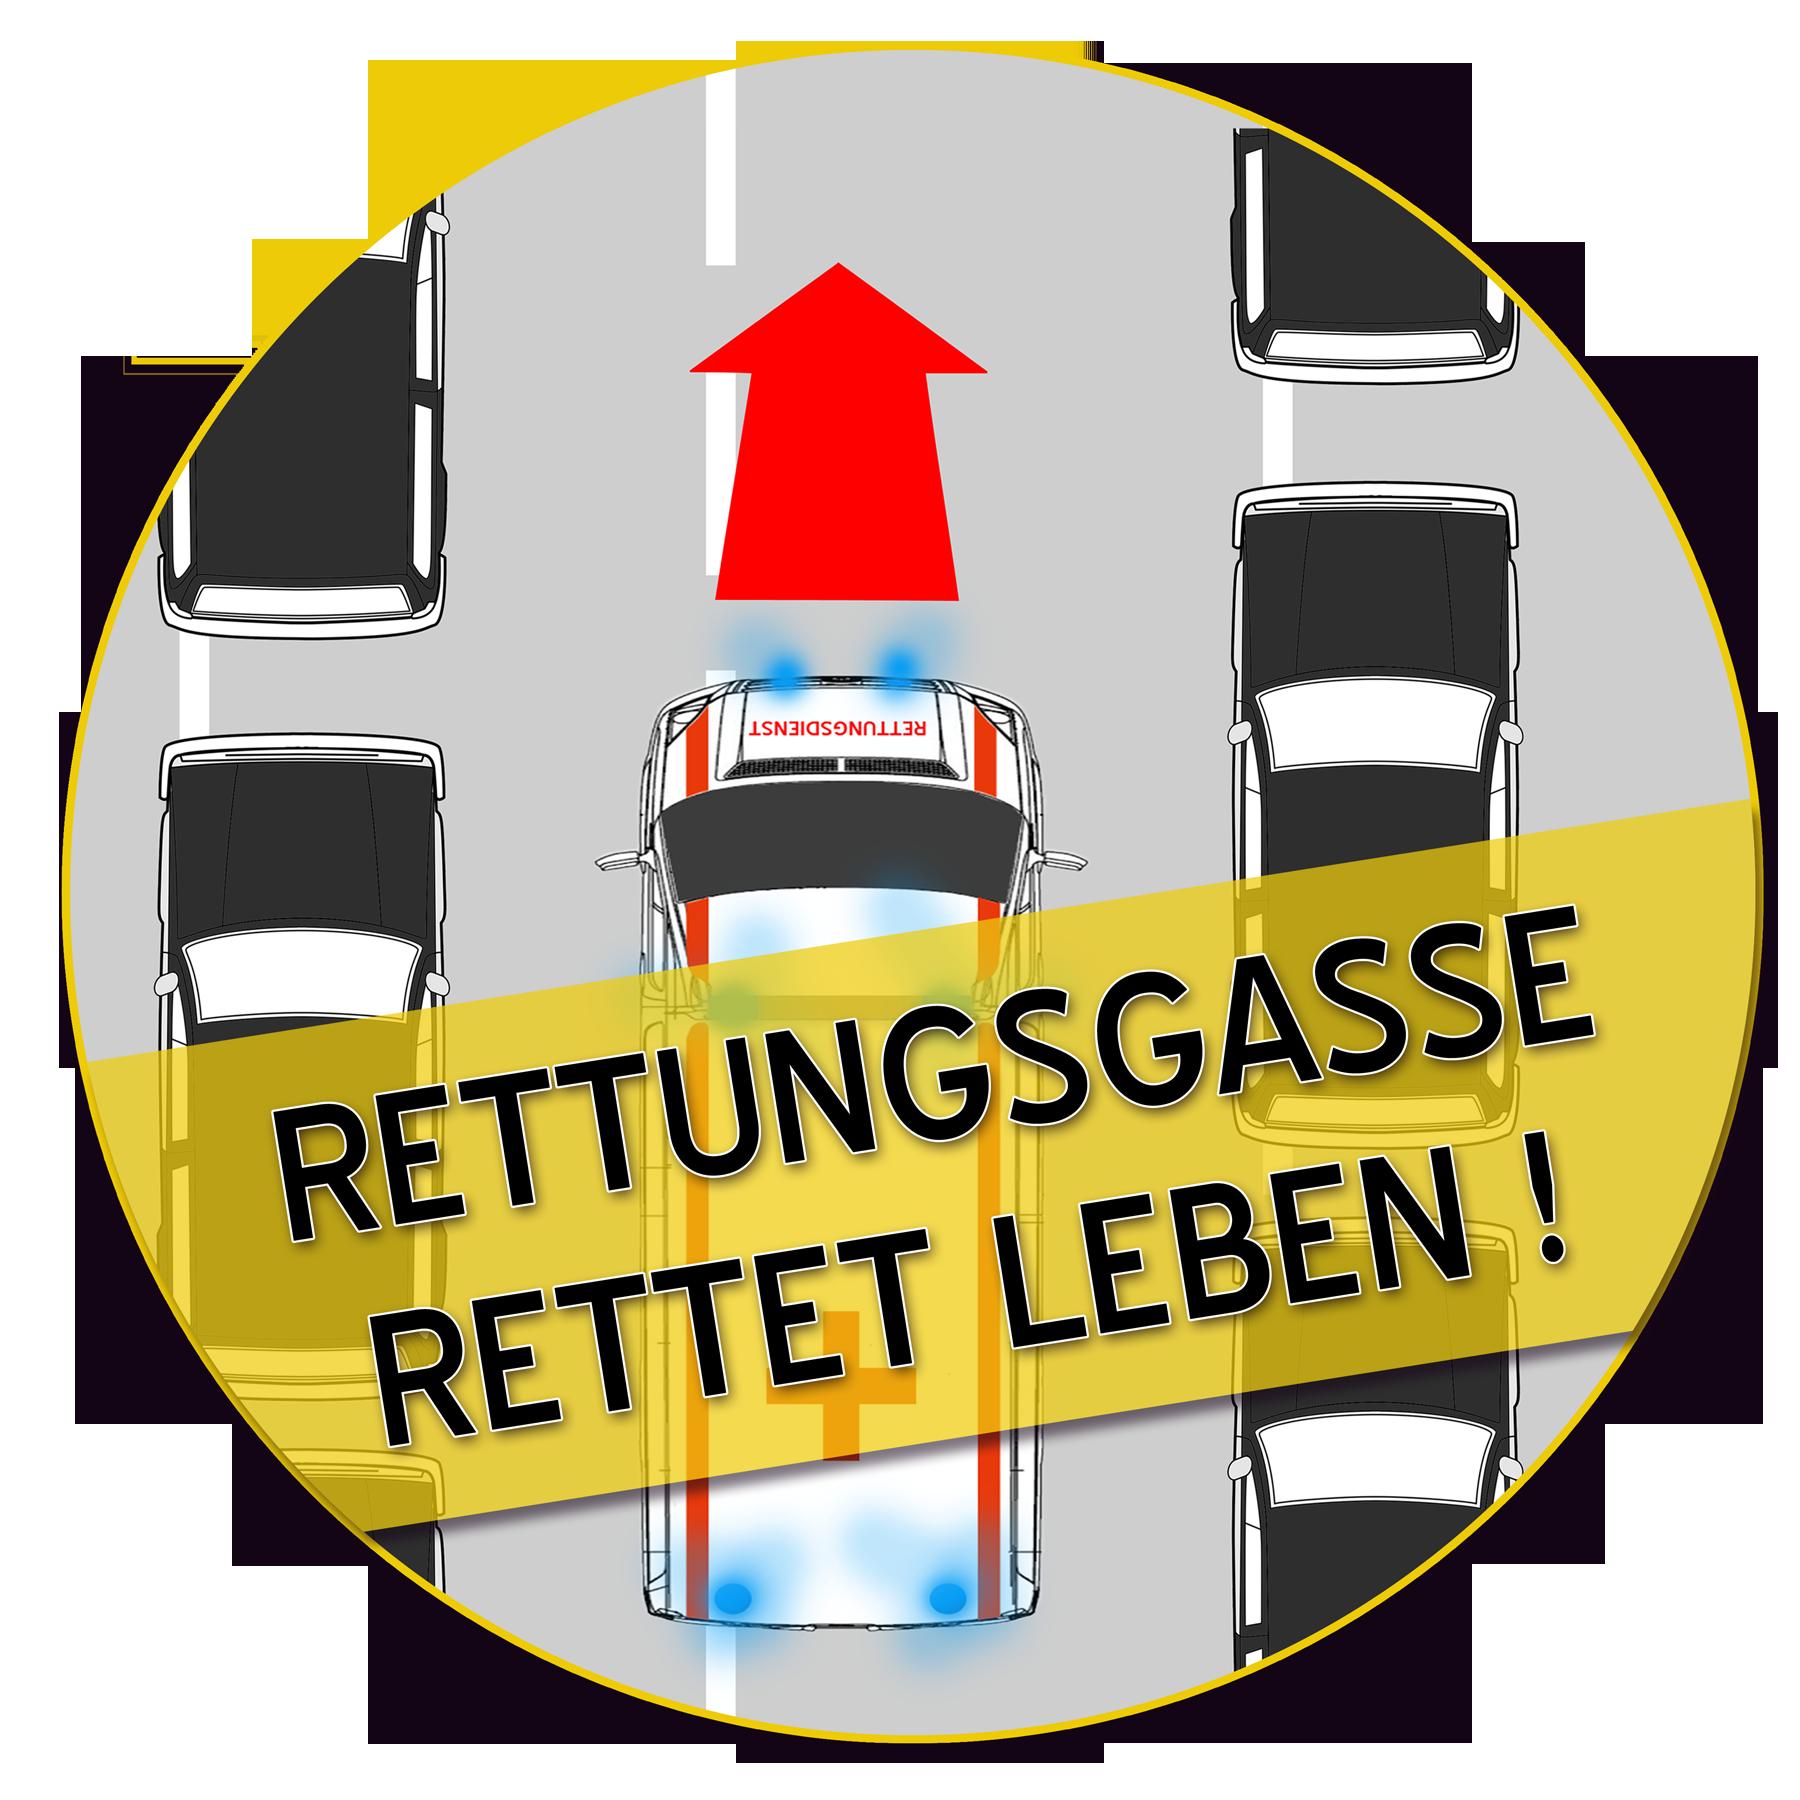 link: www.rettungsgasse-rettet-leben.de